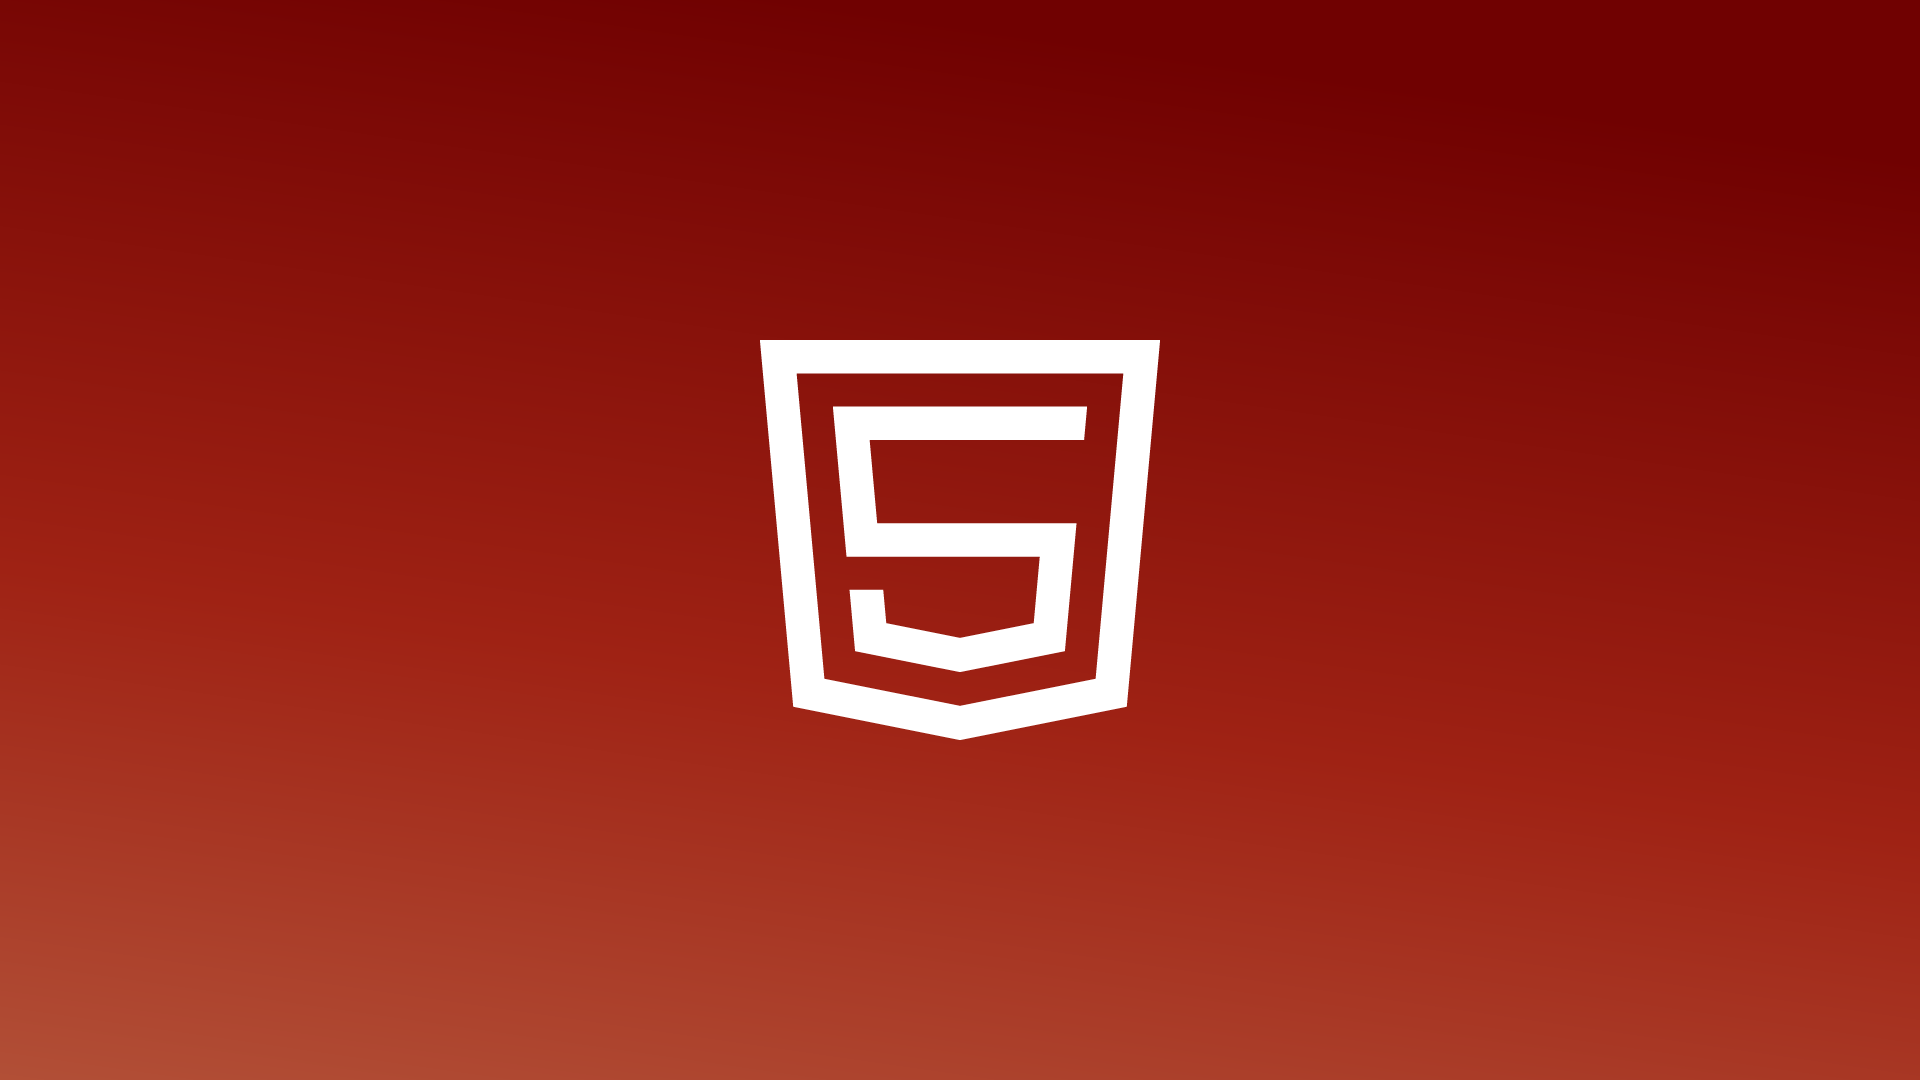 HTML5 - Events, Storage, Video & Audio Training